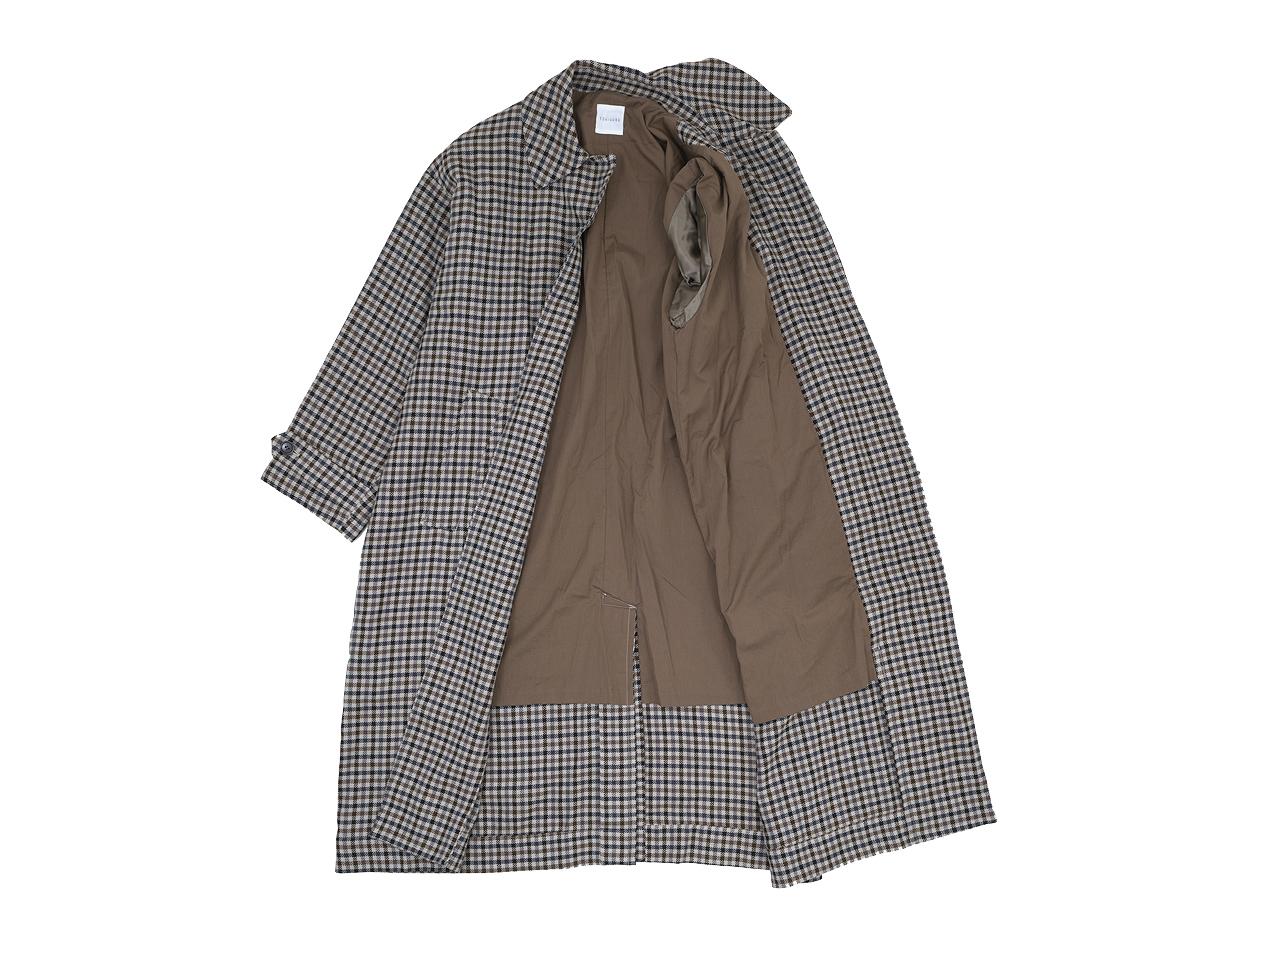 TOUJOURS Oversized Soutien Collar Robe Coat 【KM33HC01】